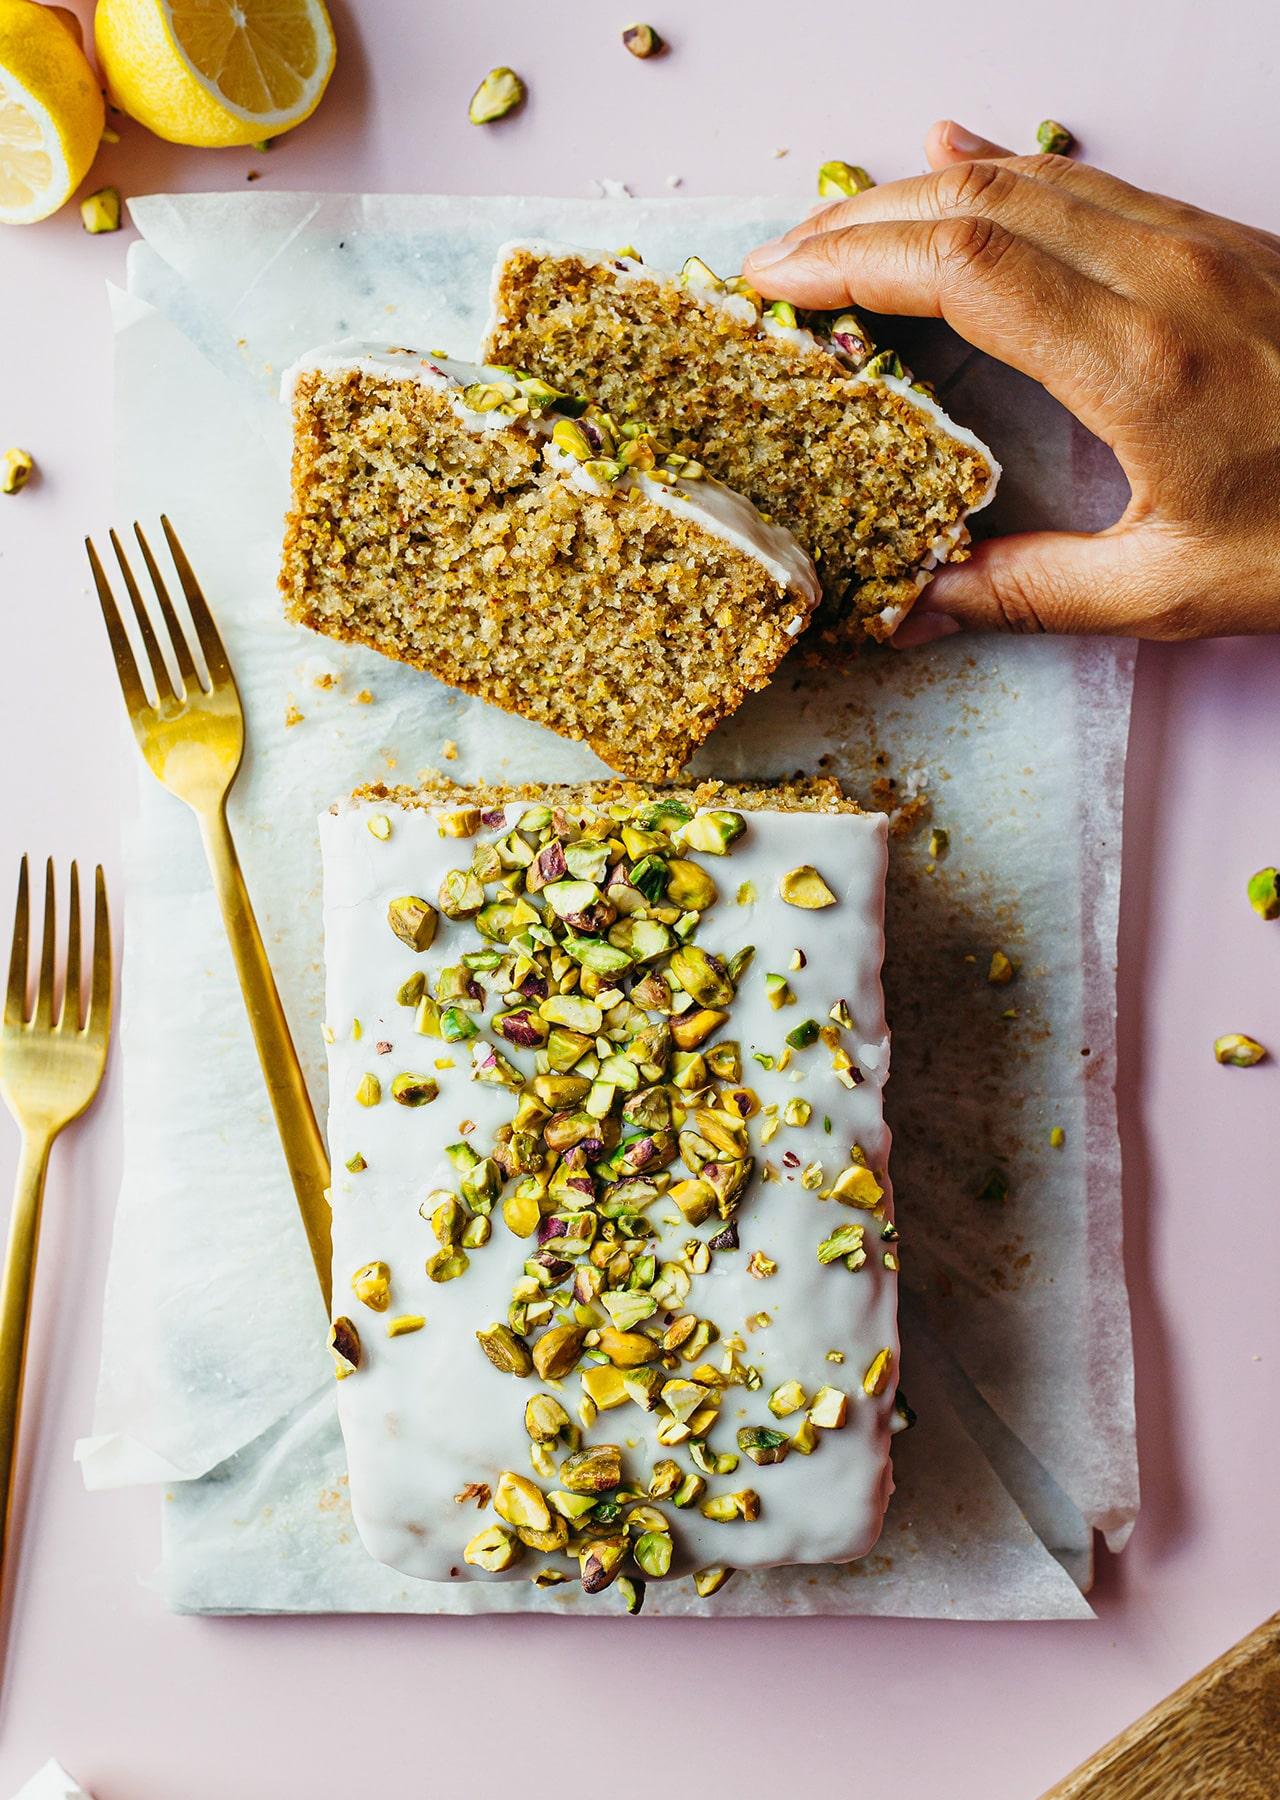 Vegan Pistachio & Cardamom Lemon Drizzle Cake Recipe